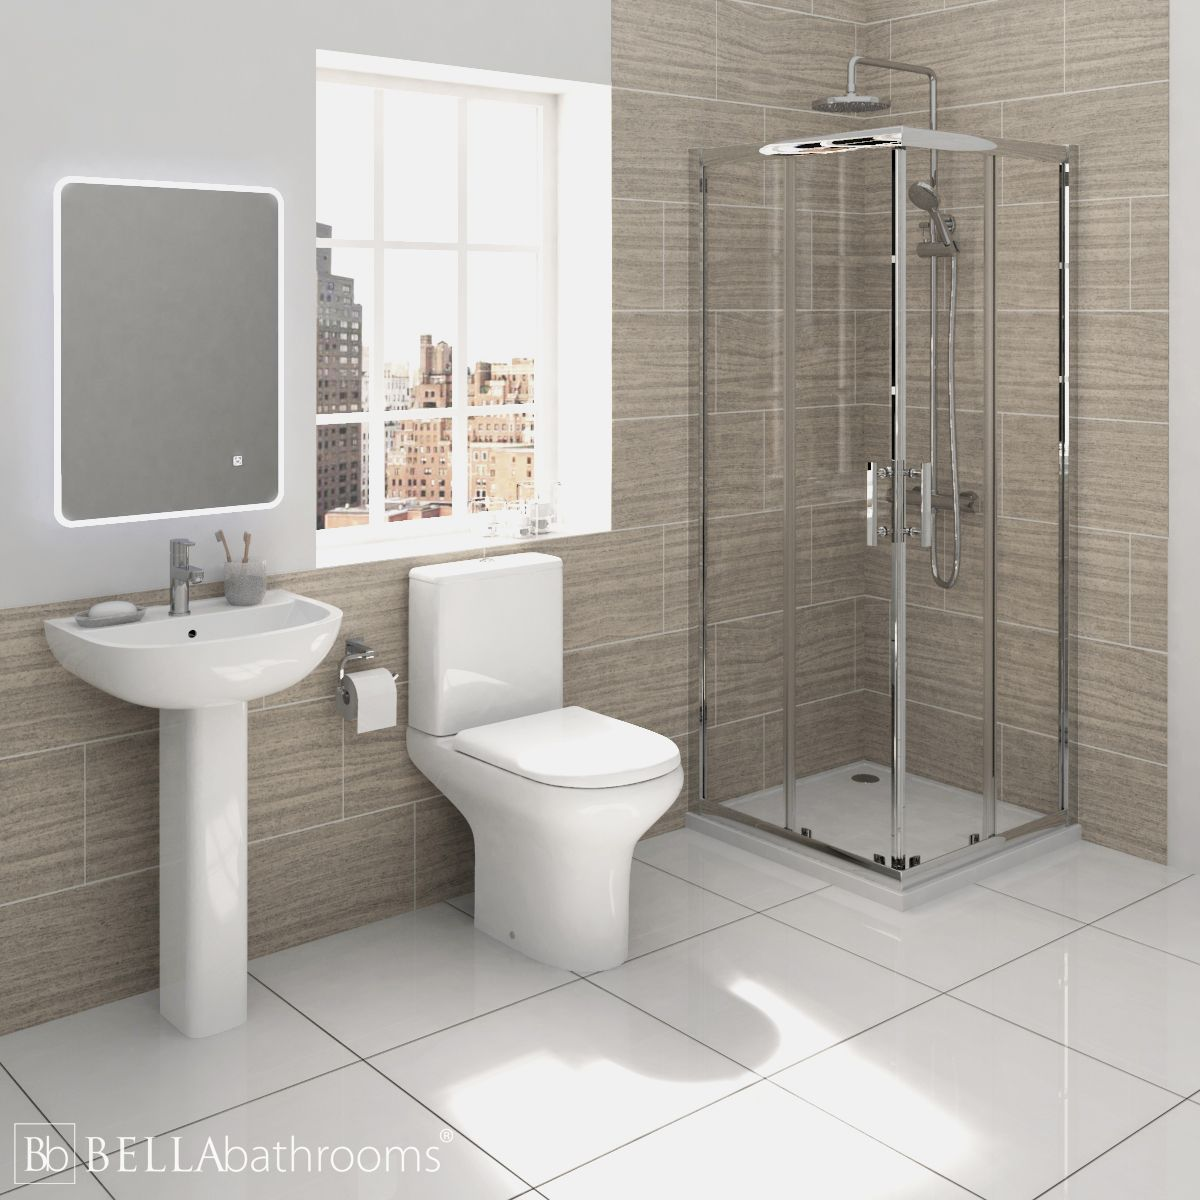 RAK Compact Shower Suite with Pacific Corner Entry Shower Enclosure